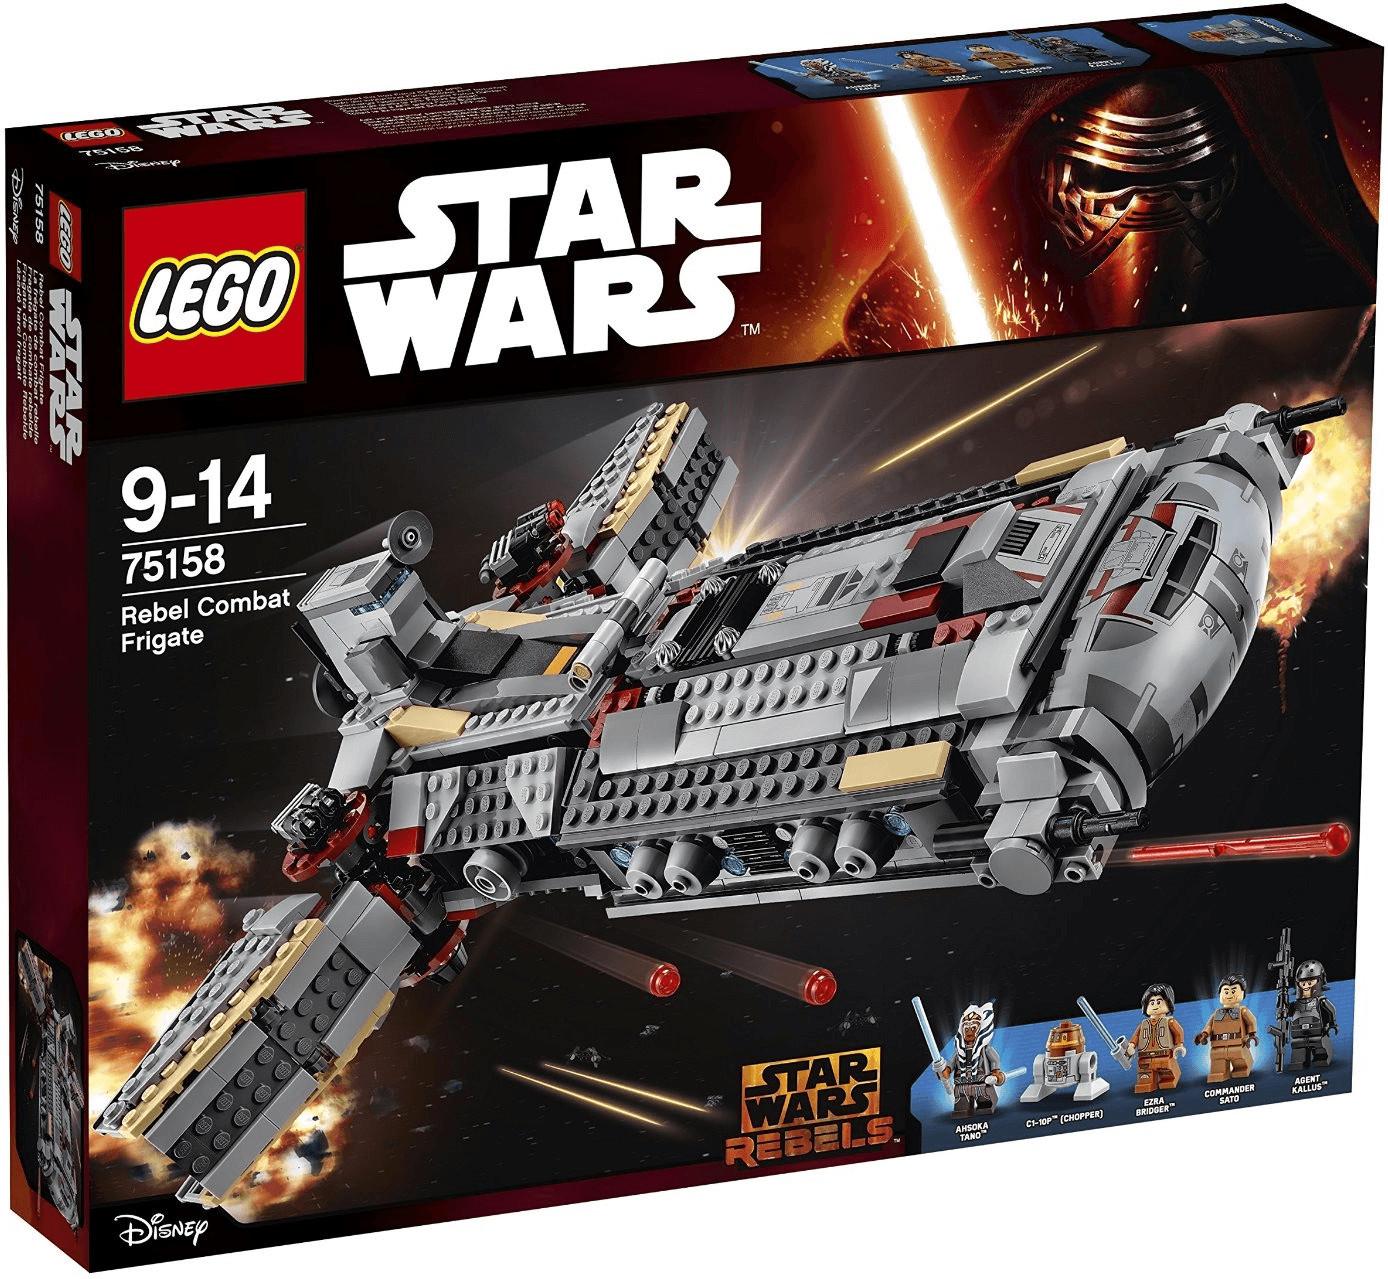 LEGO Star Wars - Rebel Combat Frigate (75158)